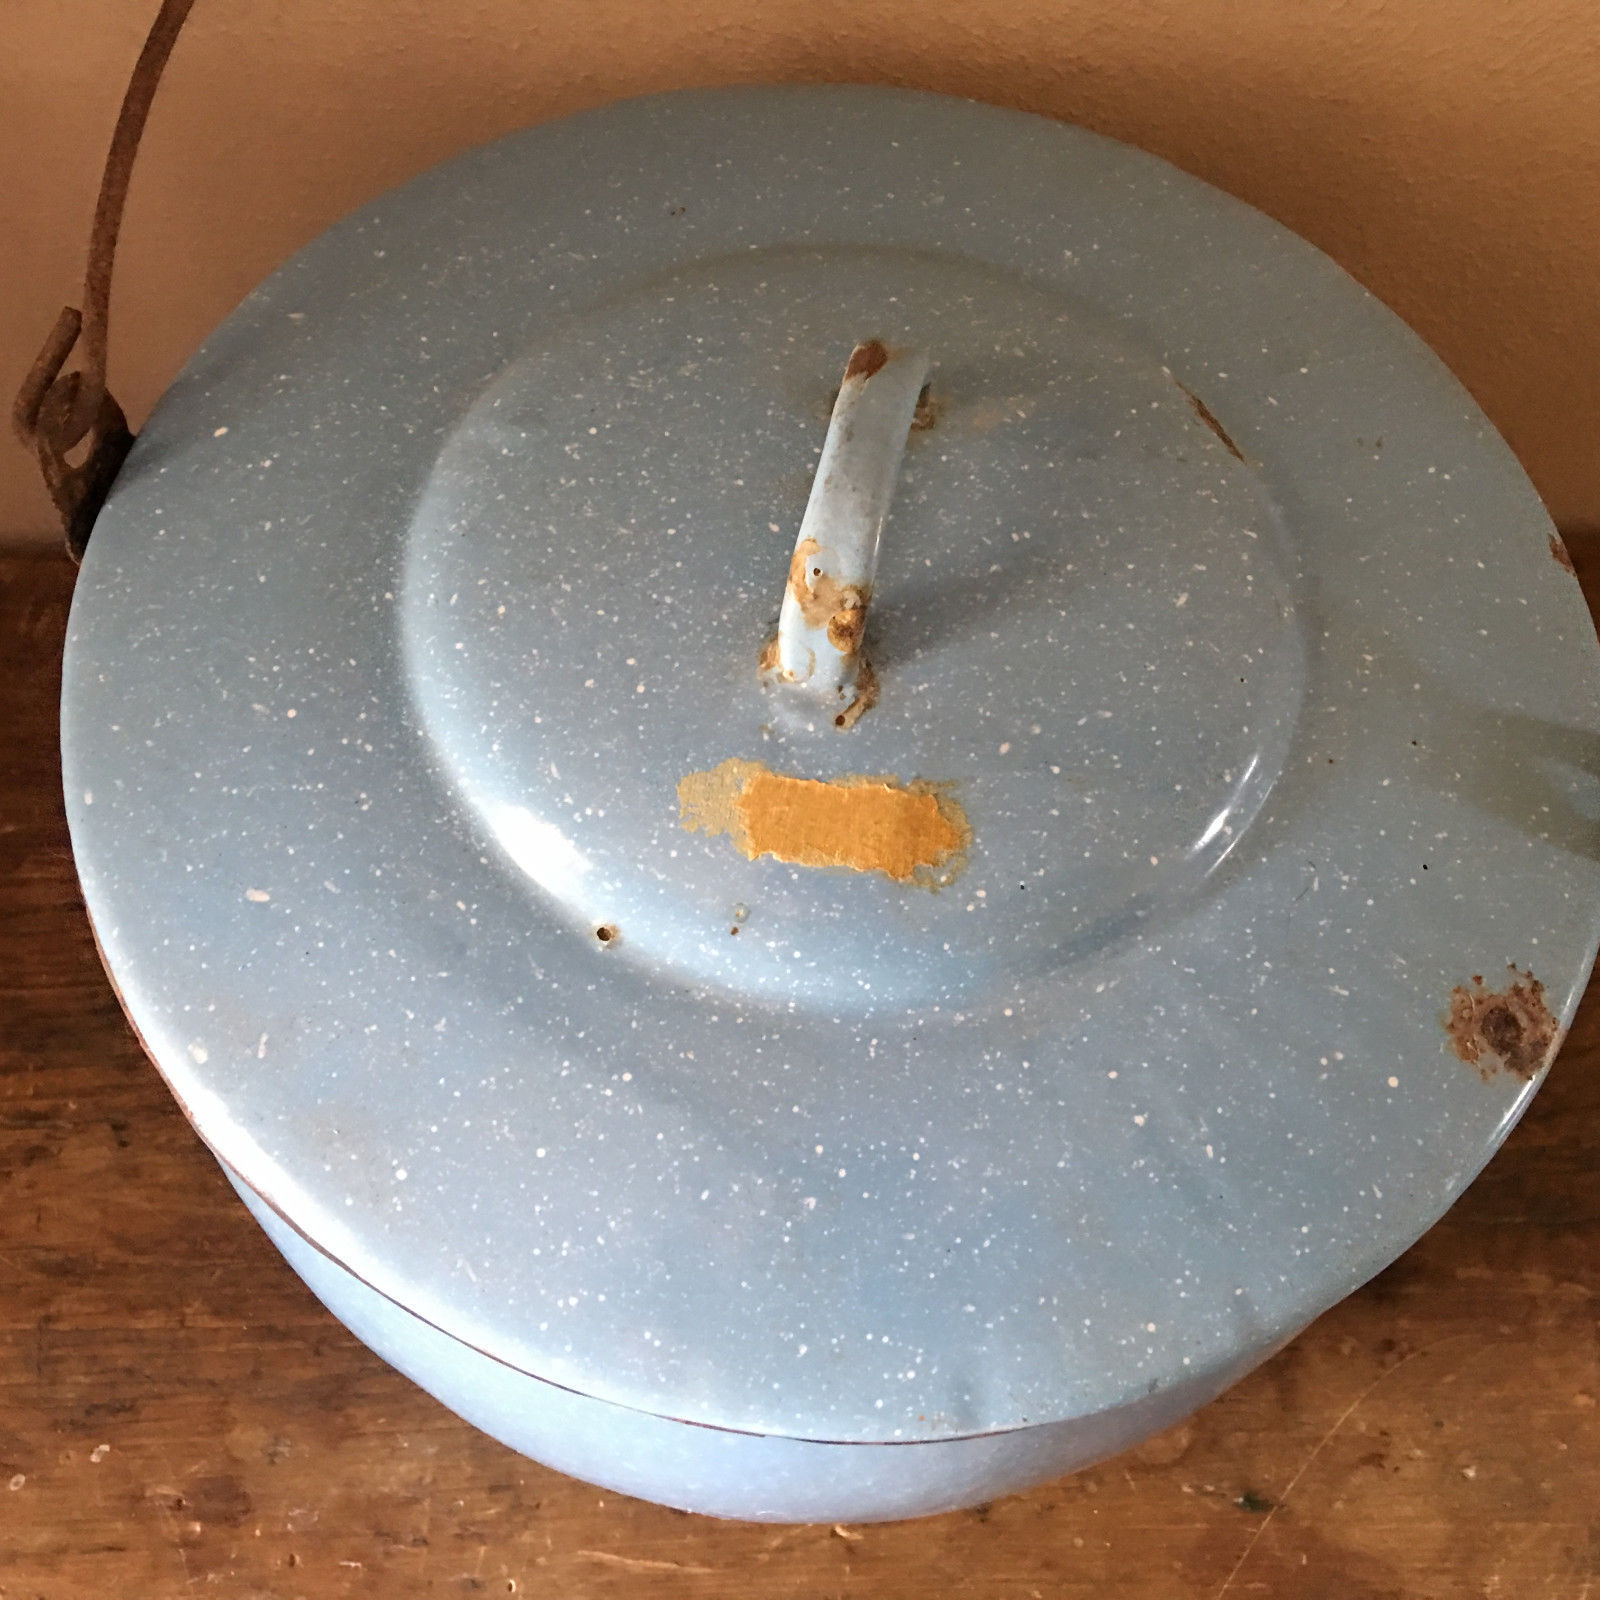 "VTG Enamelware Pail Kettle Blue Stock Pot Lid Wood Handle 10"" Estate camping image 4"